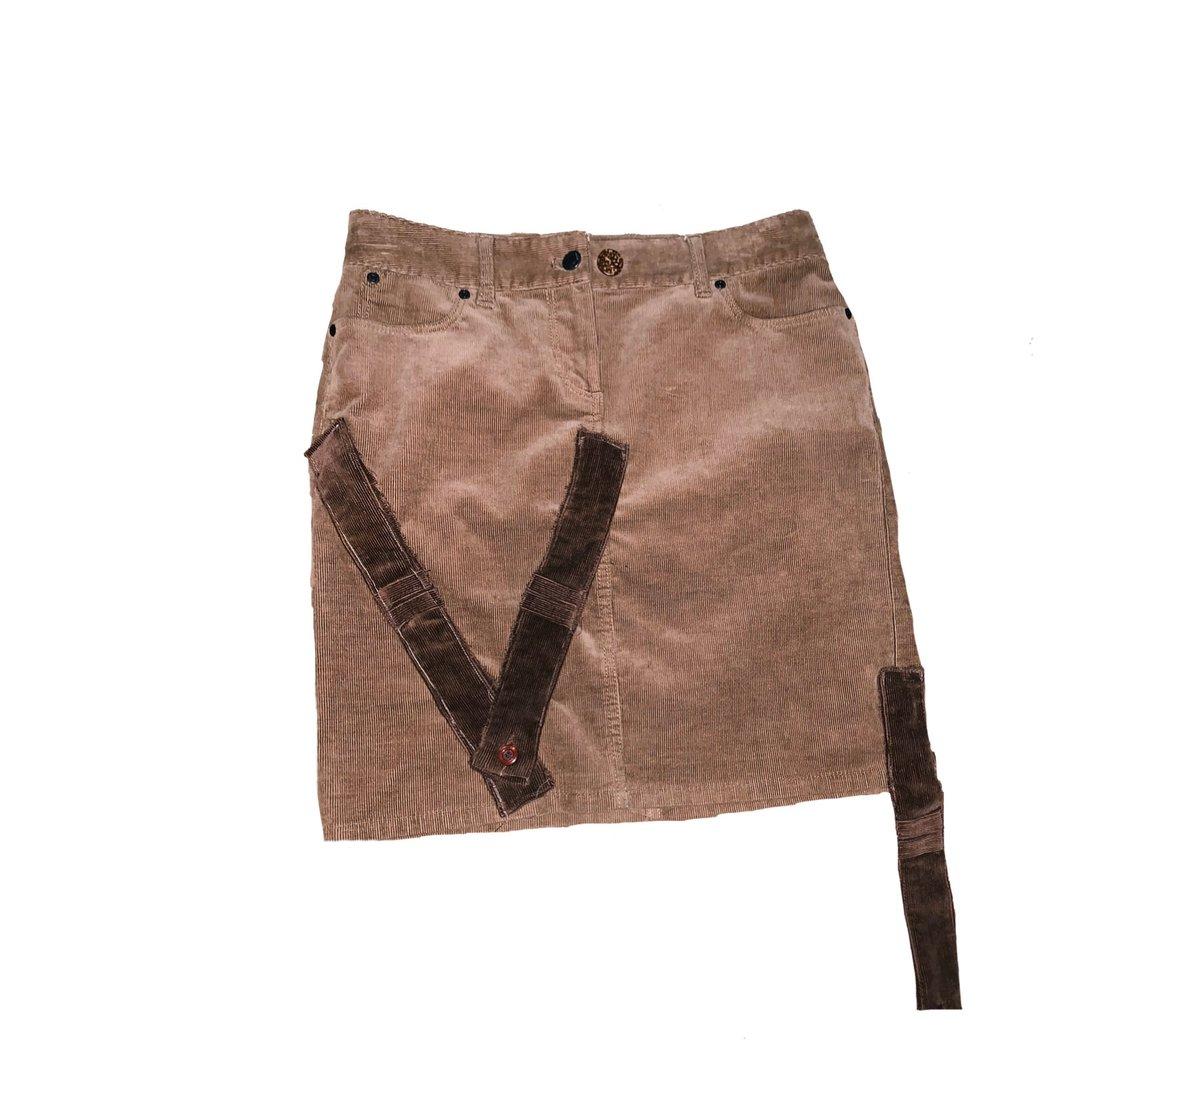 1 of 1 Chocolate/Caramel Skirt